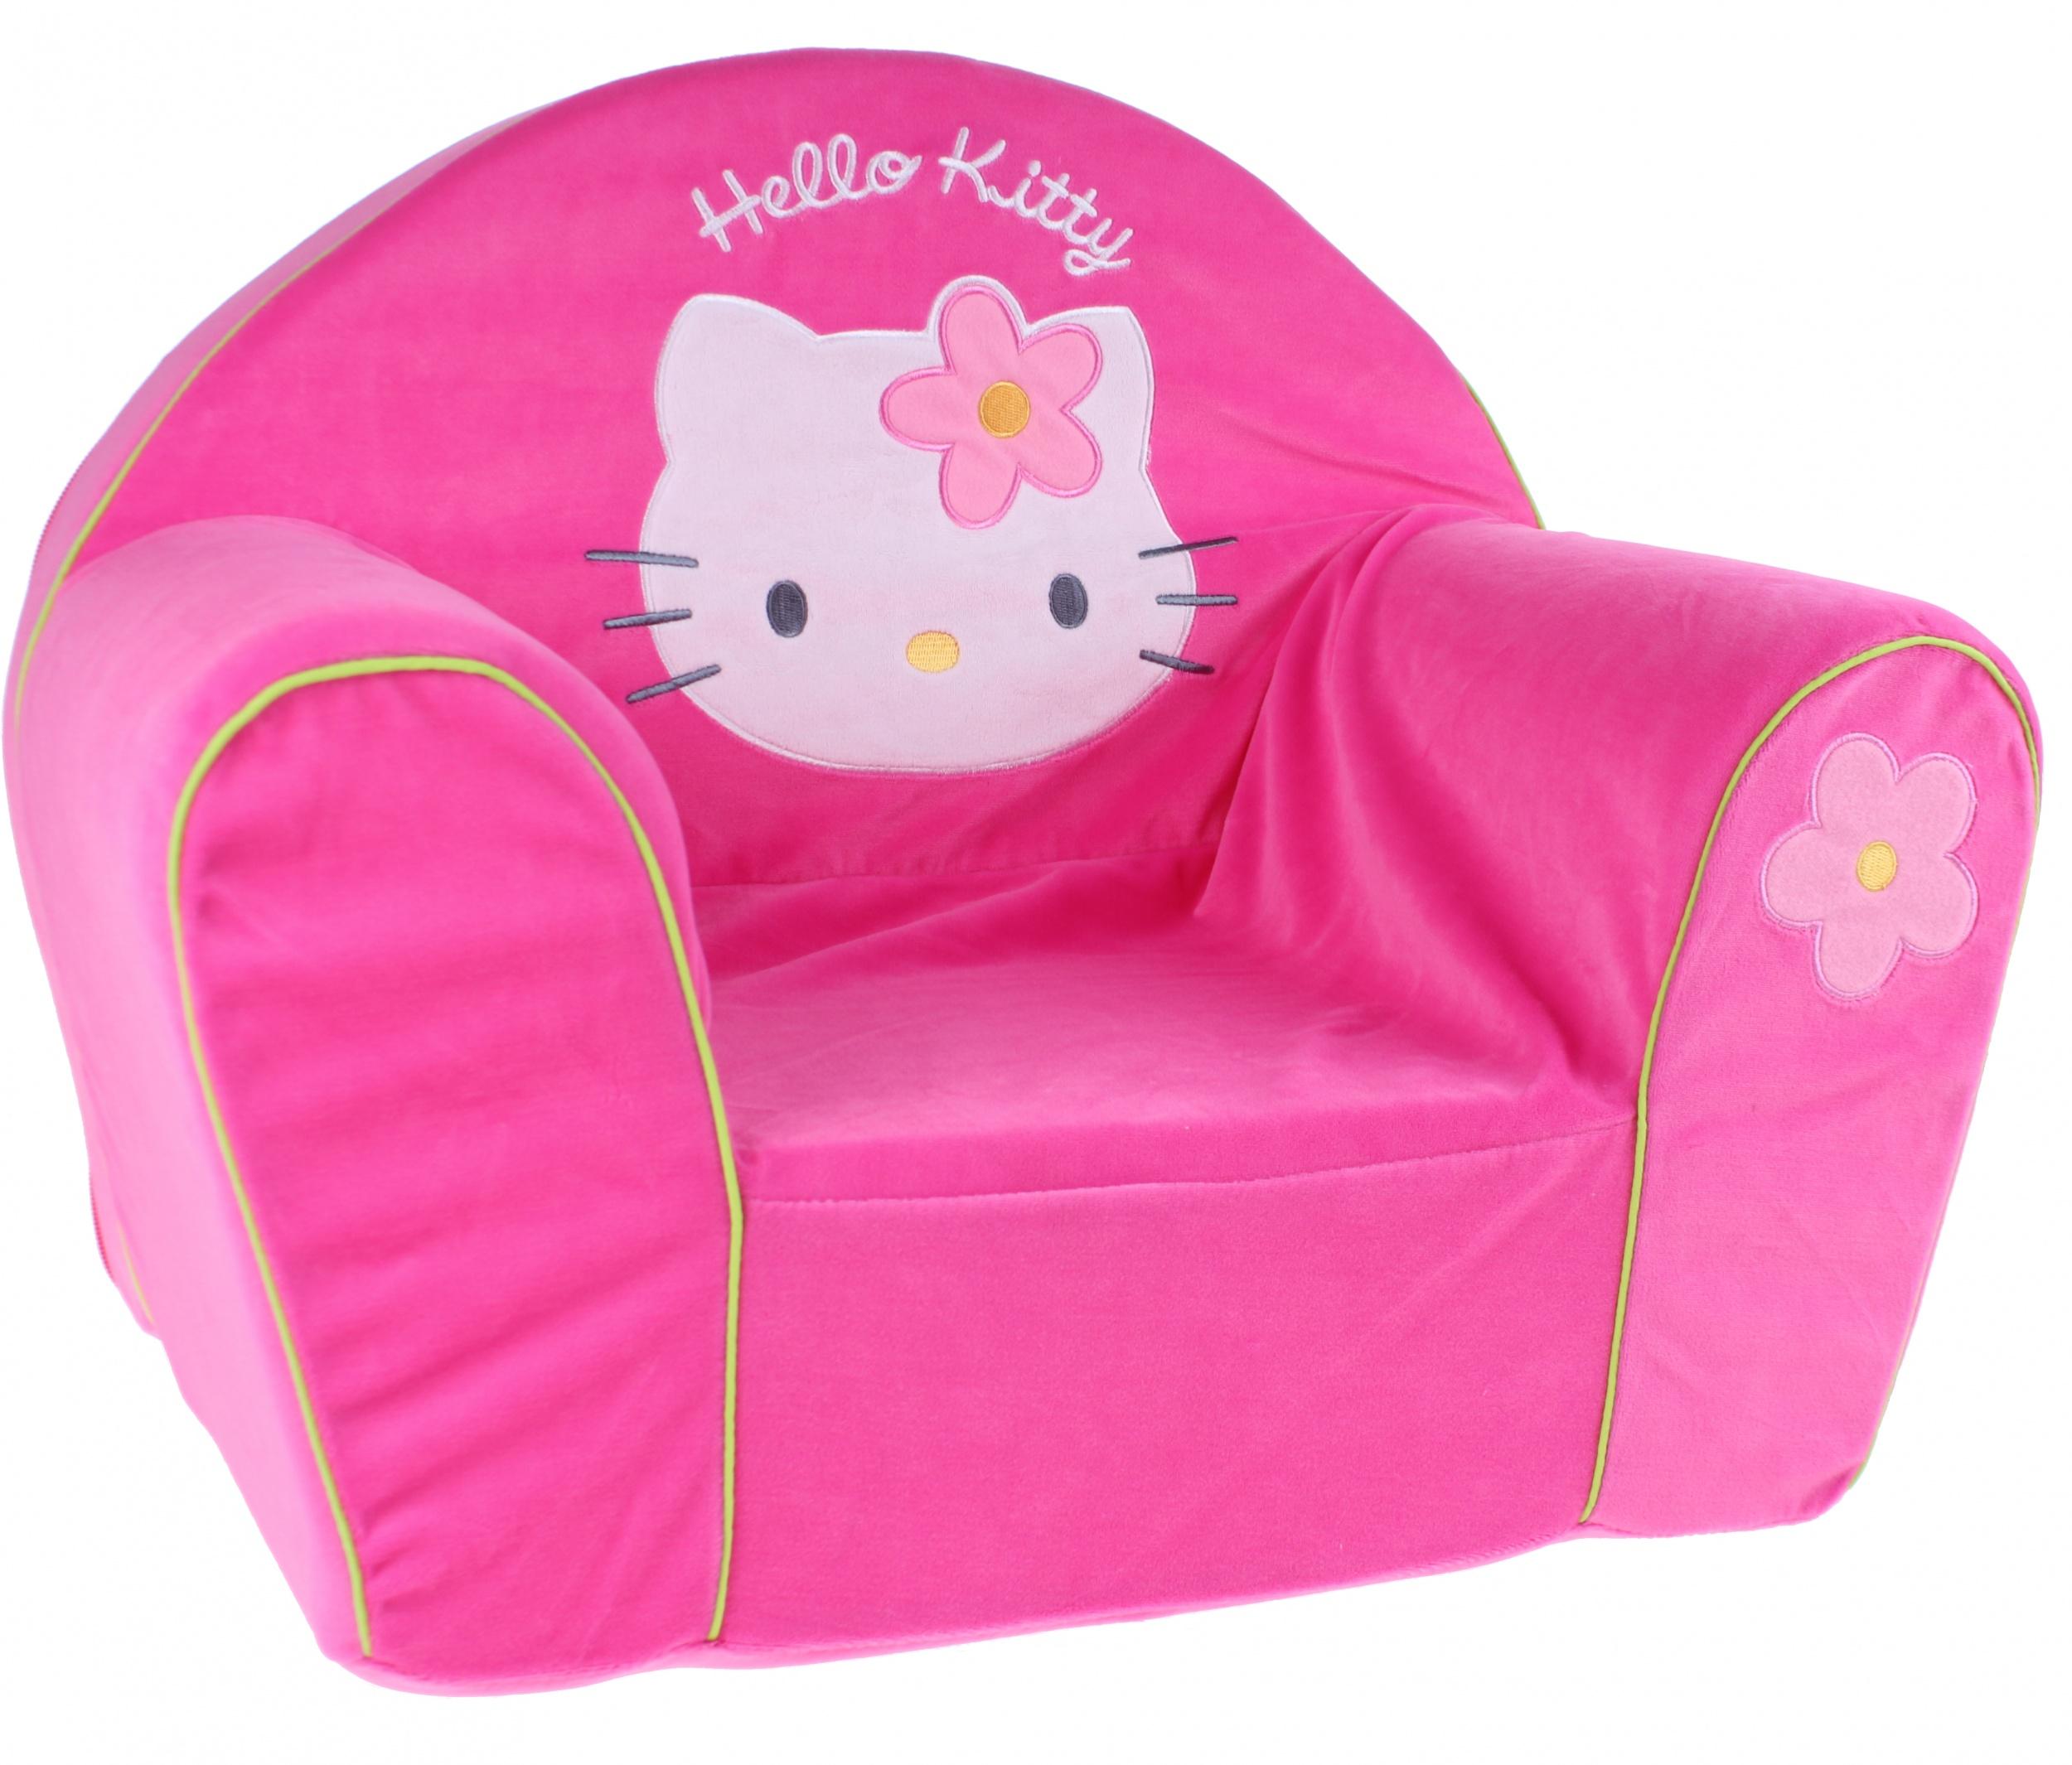 Hello Kitty Chair Girls Pink 52 X 33 X 42 Cm Internet Toys